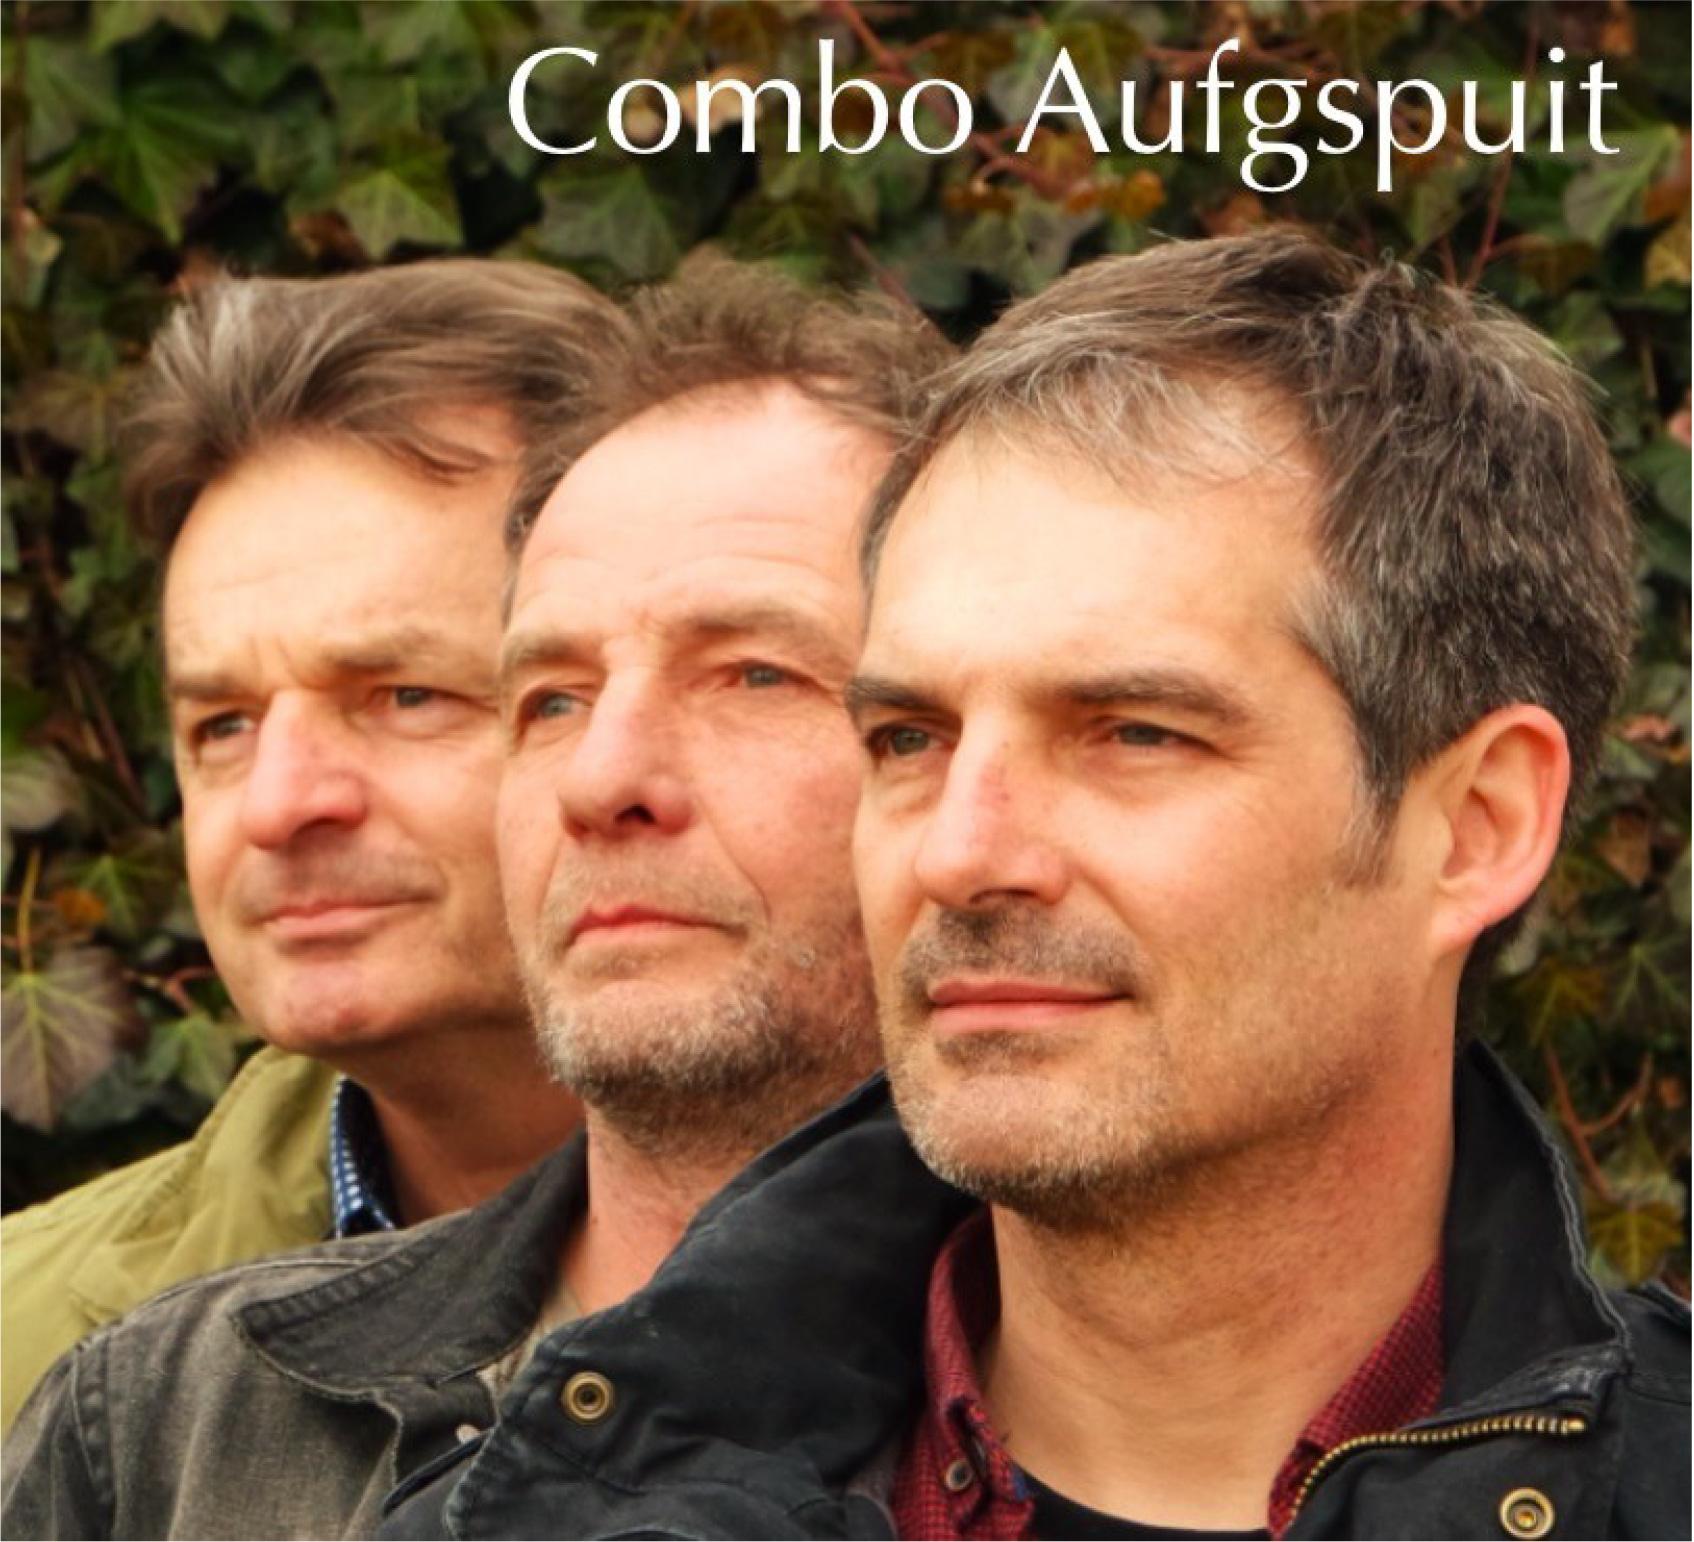 Combo Aufgspuit